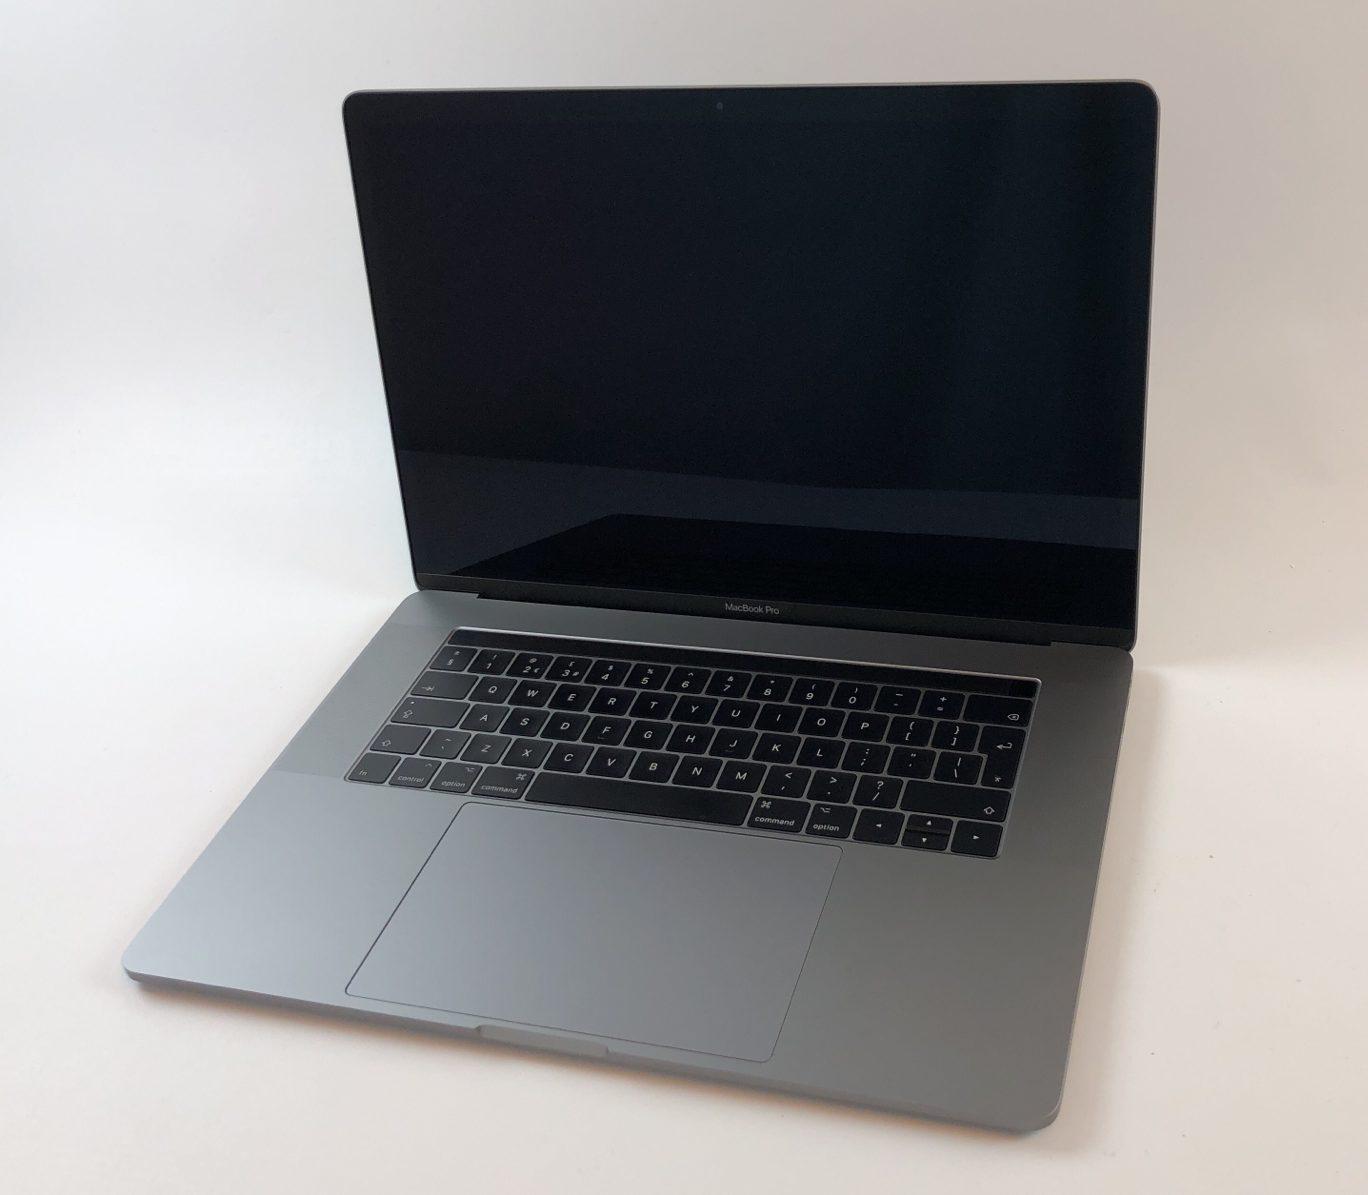 "MacBook Pro 15"" Touch Bar Mid 2017 (Intel Quad-Core i7 2.9 GHz 16 GB RAM 512 GB SSD), Space Gray, Intel Quad-Core i7 2.9 GHz, 16 GB RAM, 512 GB SSD, image 1"